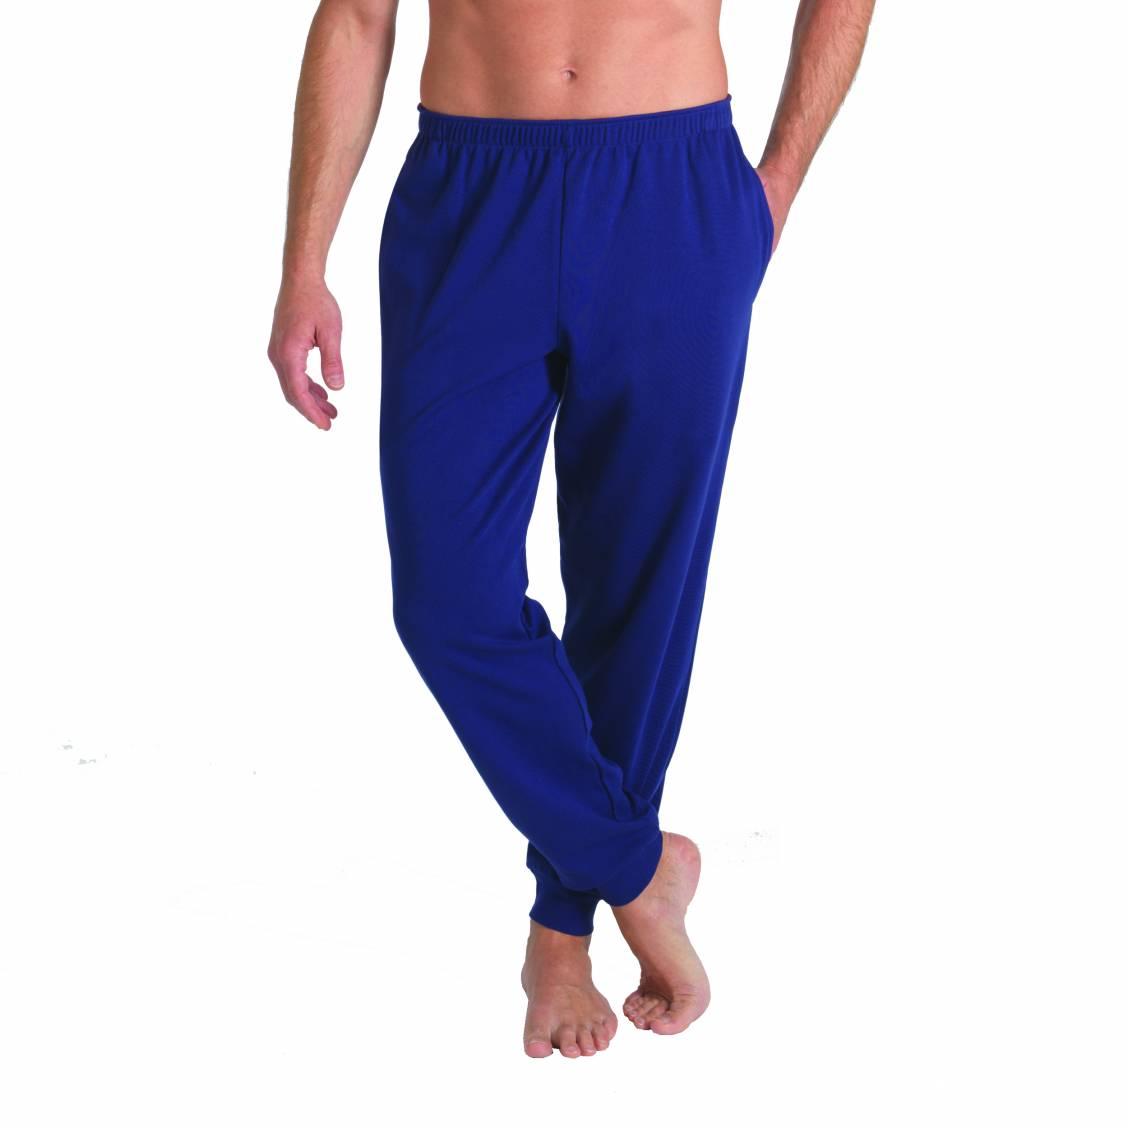 pantalon d 39 int rieur eminence en coton bleu marine rue des hommes. Black Bedroom Furniture Sets. Home Design Ideas